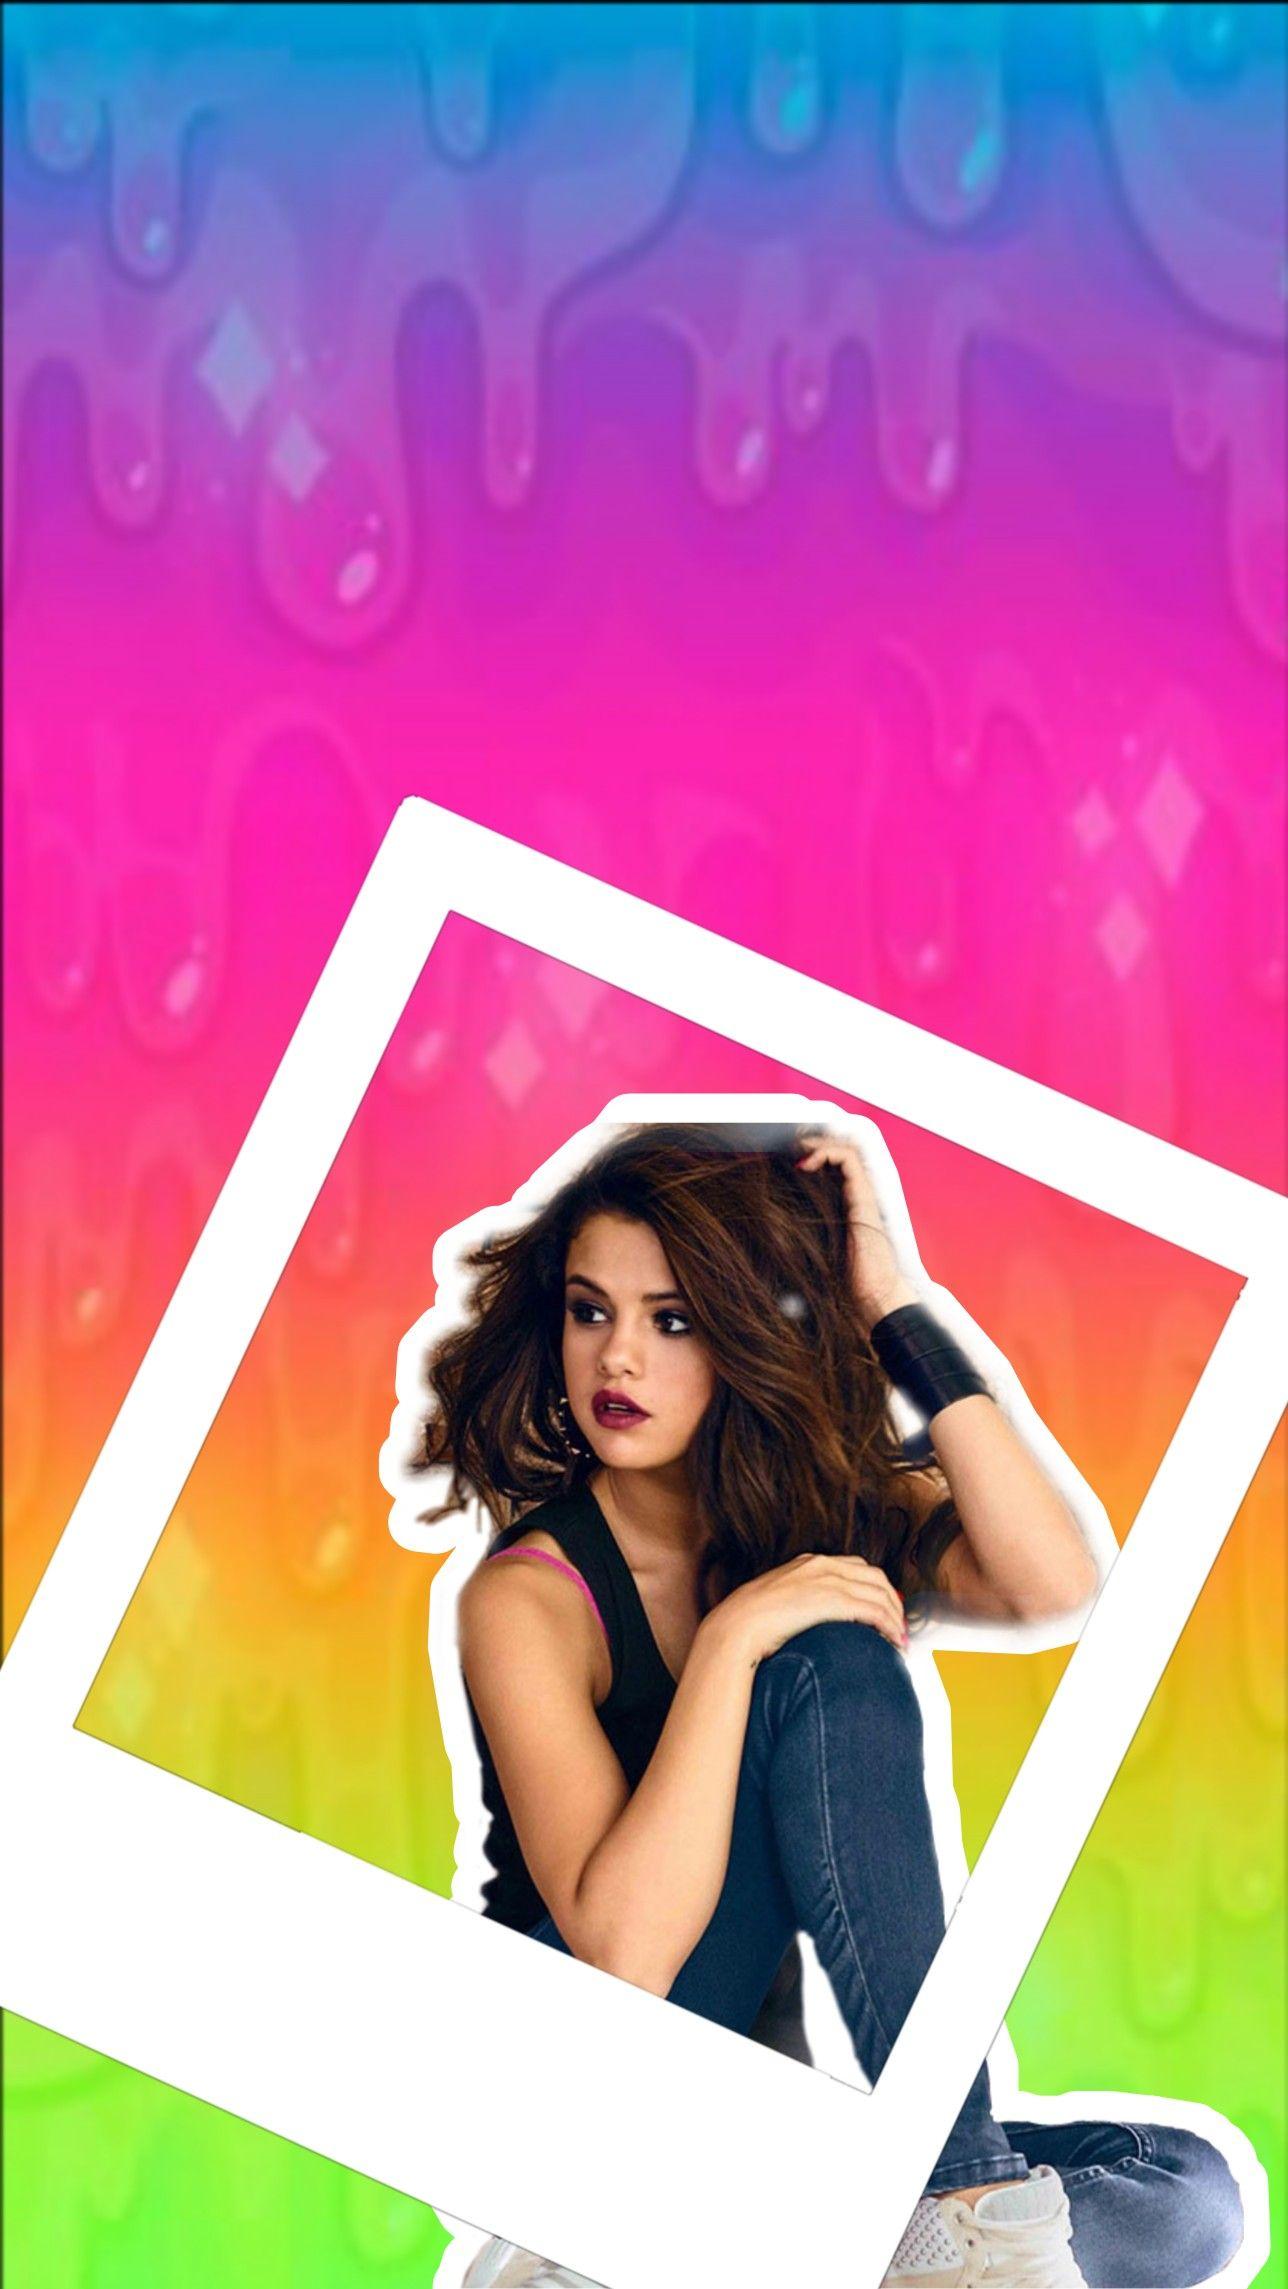 Fond D Ecran Selena Gomez Selena Gomez Selena Fond Ecran